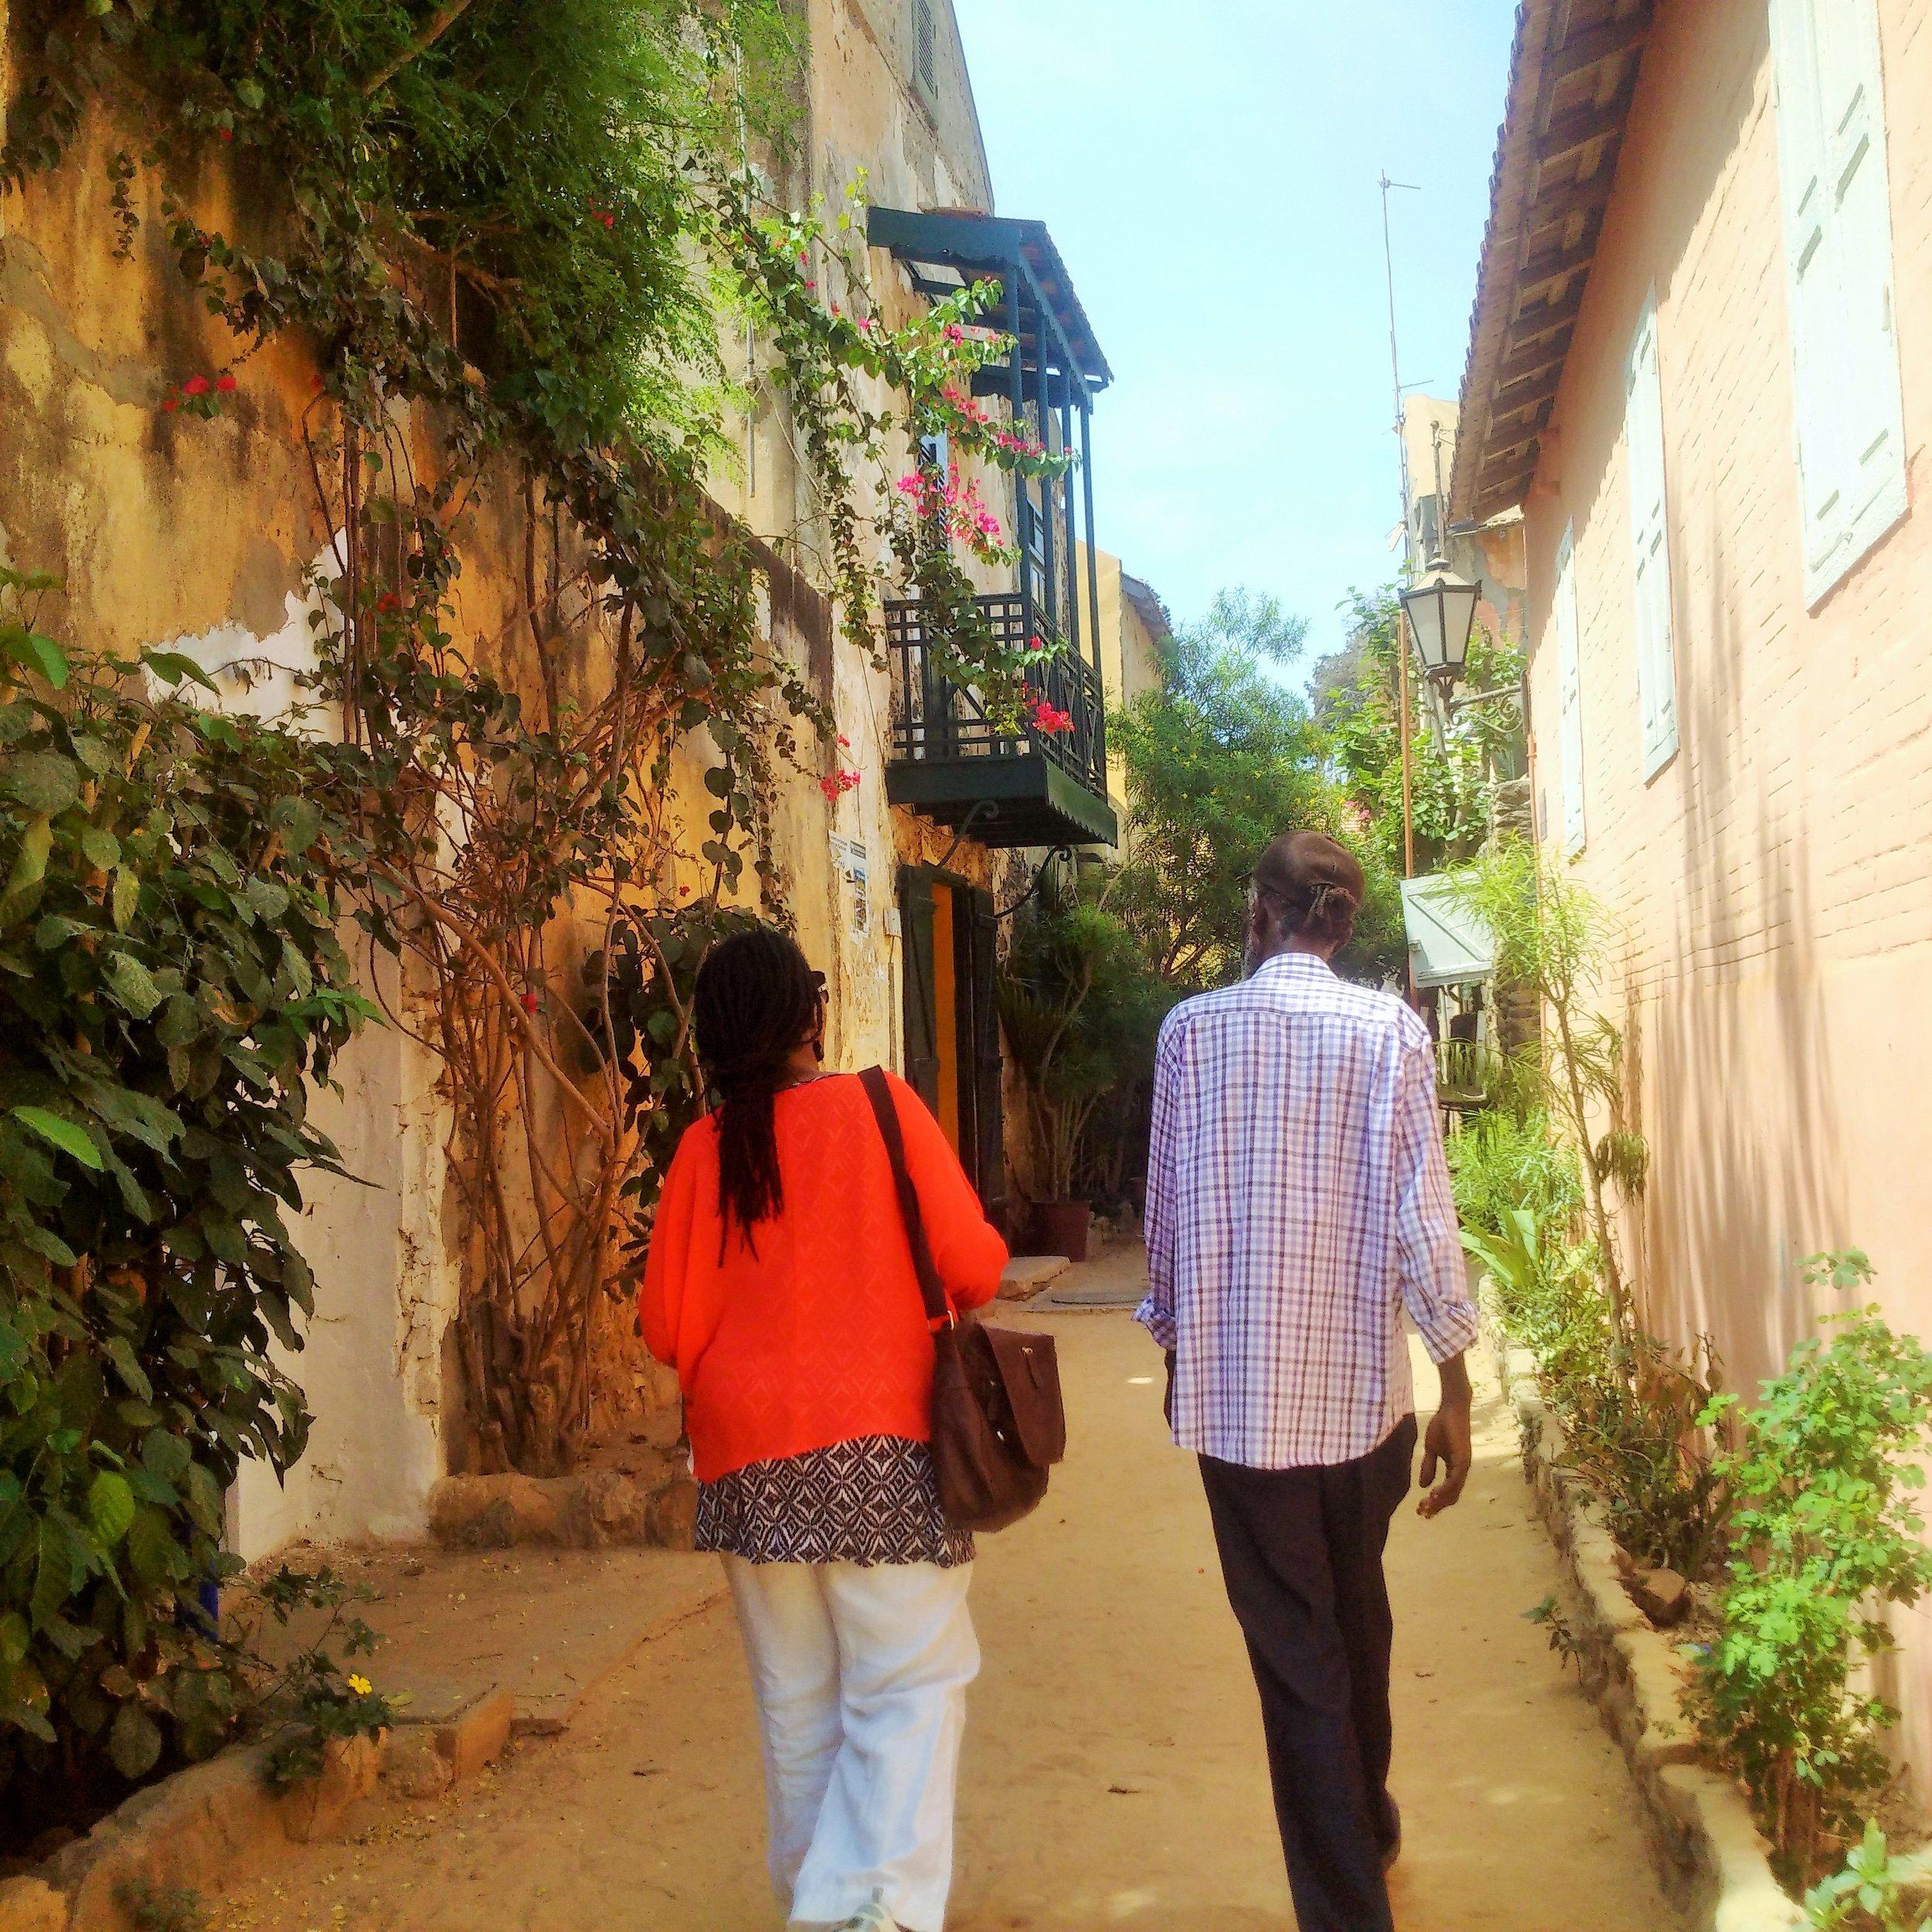 Walking the neigbourhood